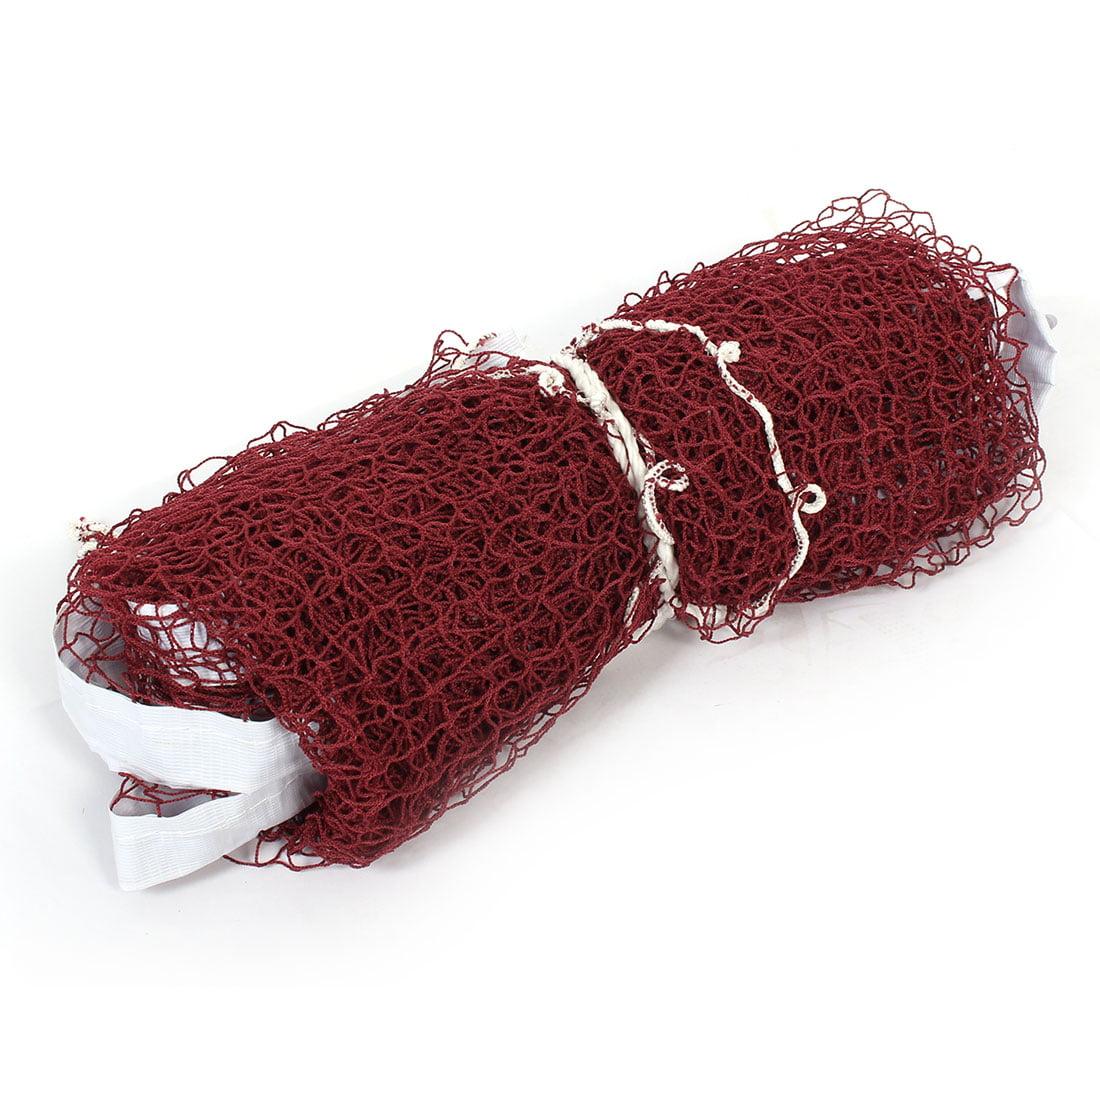 6M Length Nylon Outdoor Indoor Badminton Sport Training Mesh Net Dark Red White